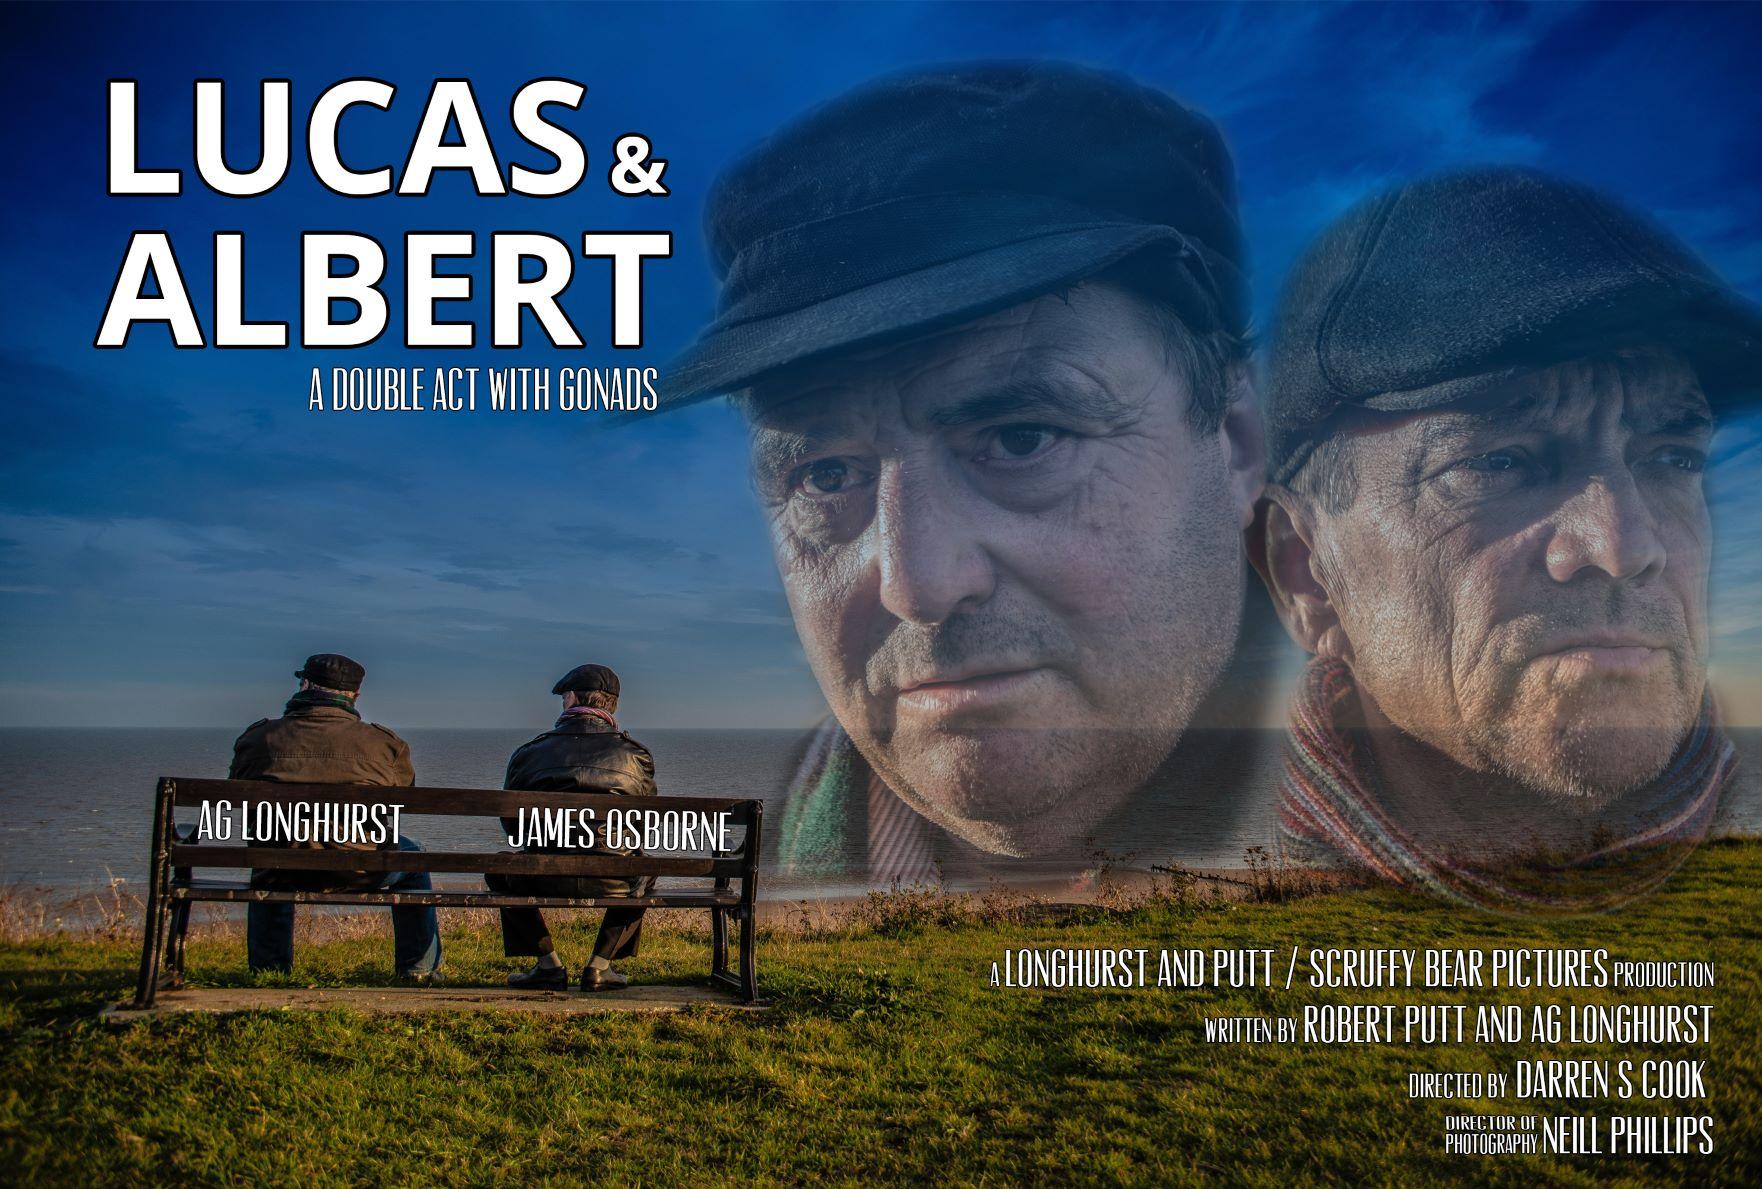 Poster of the Lucas & Albert